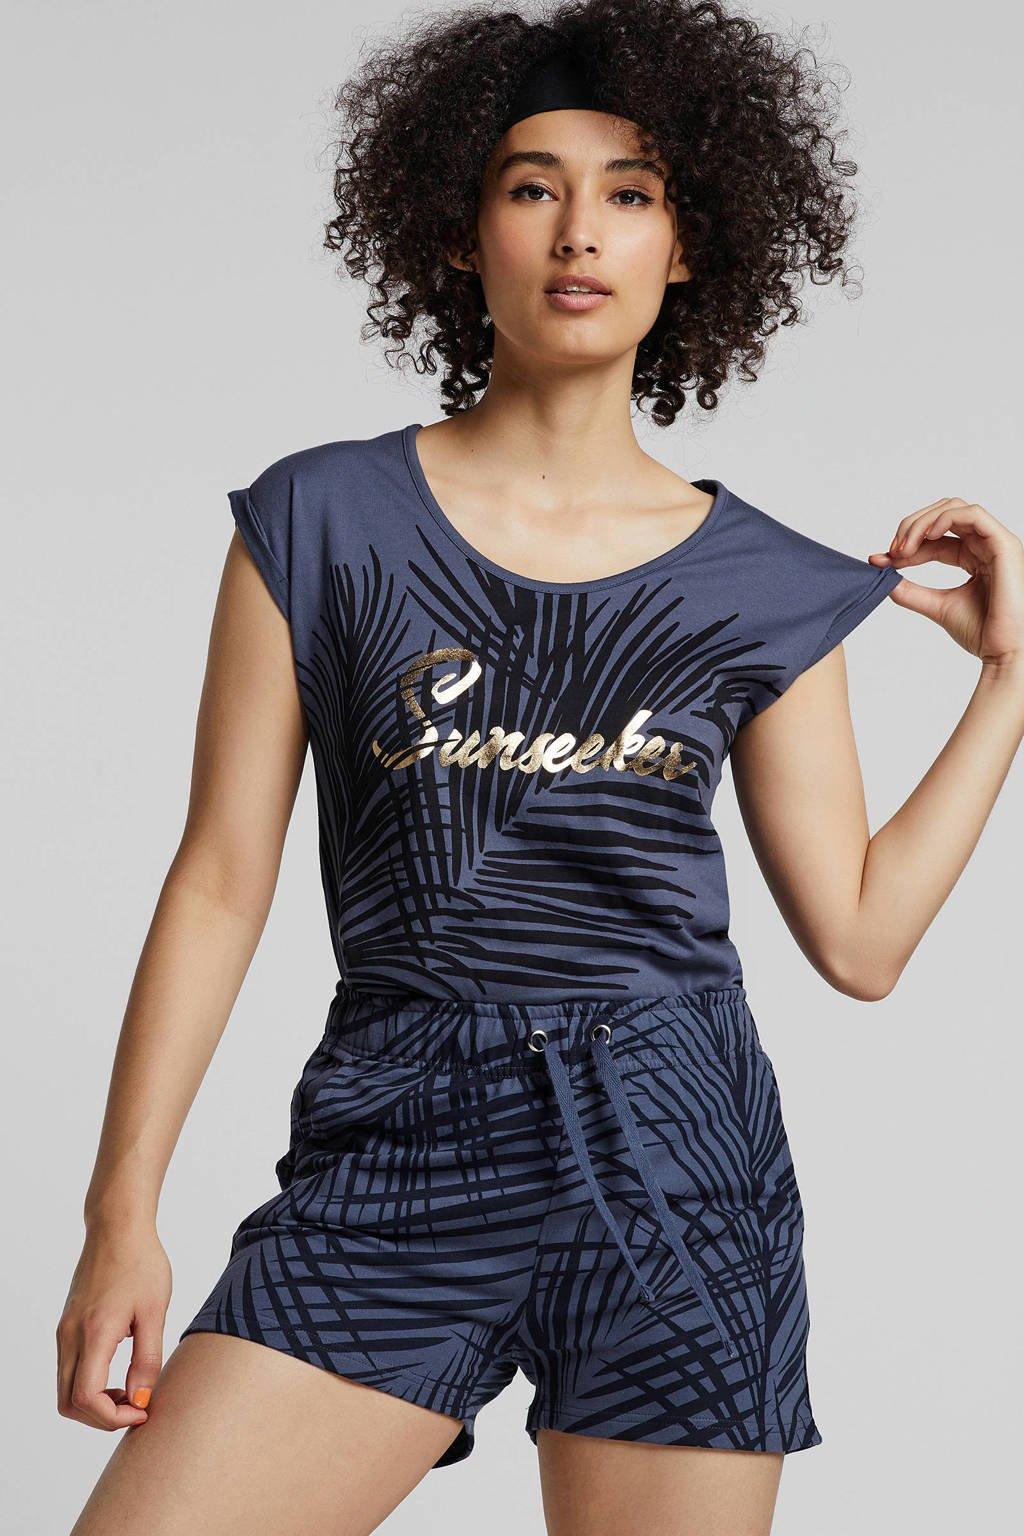 whkmp's beachwave sweatshort met bladprint, Indigoblauw/donkerblauw